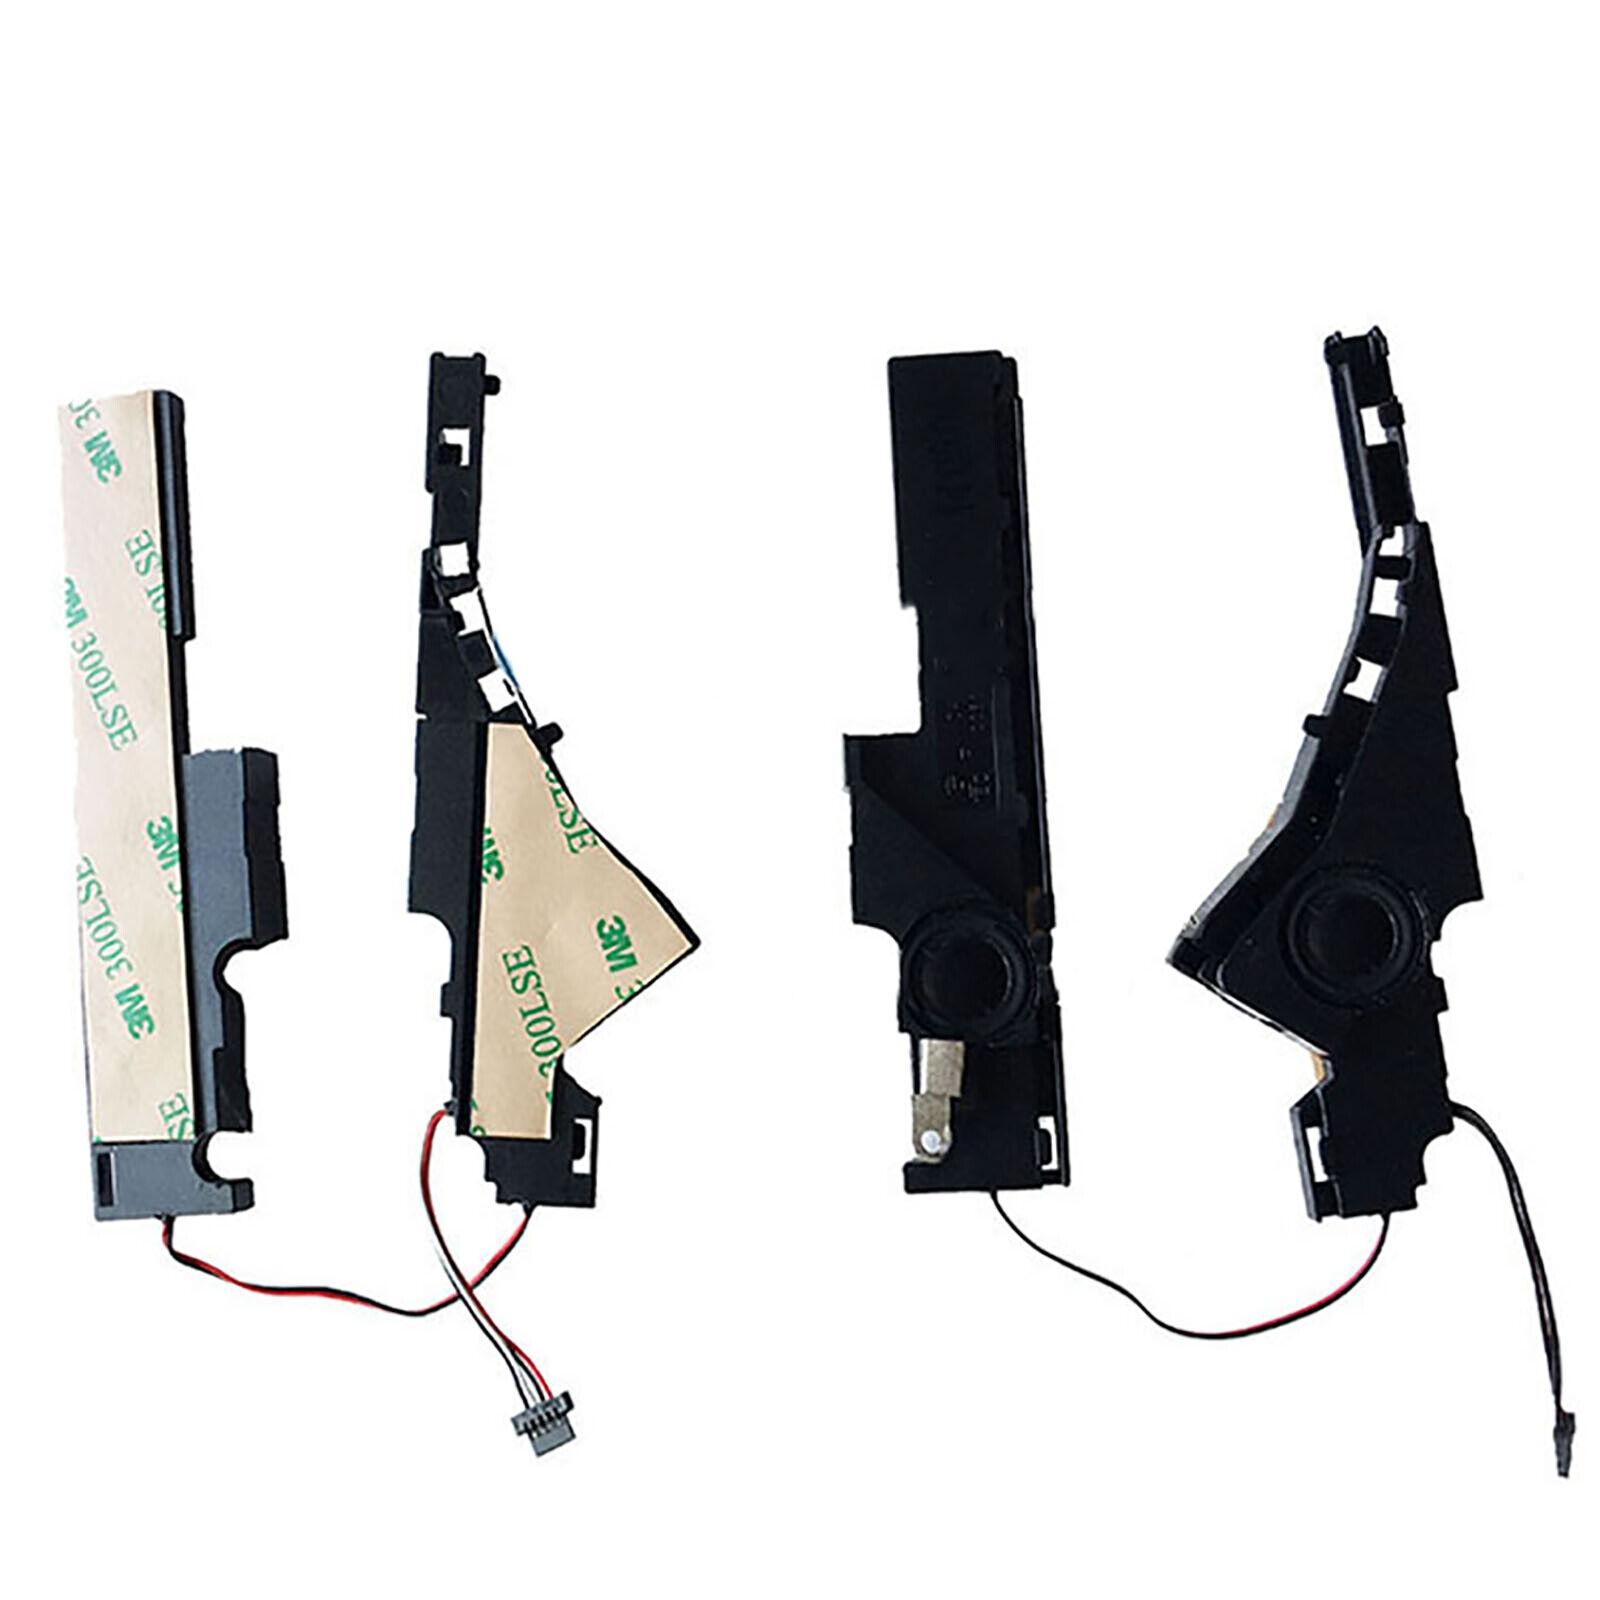 For ASUS X550 X550V FX50 F550 A550 Y581K550 W581L Notebook Built-in Speaker Part